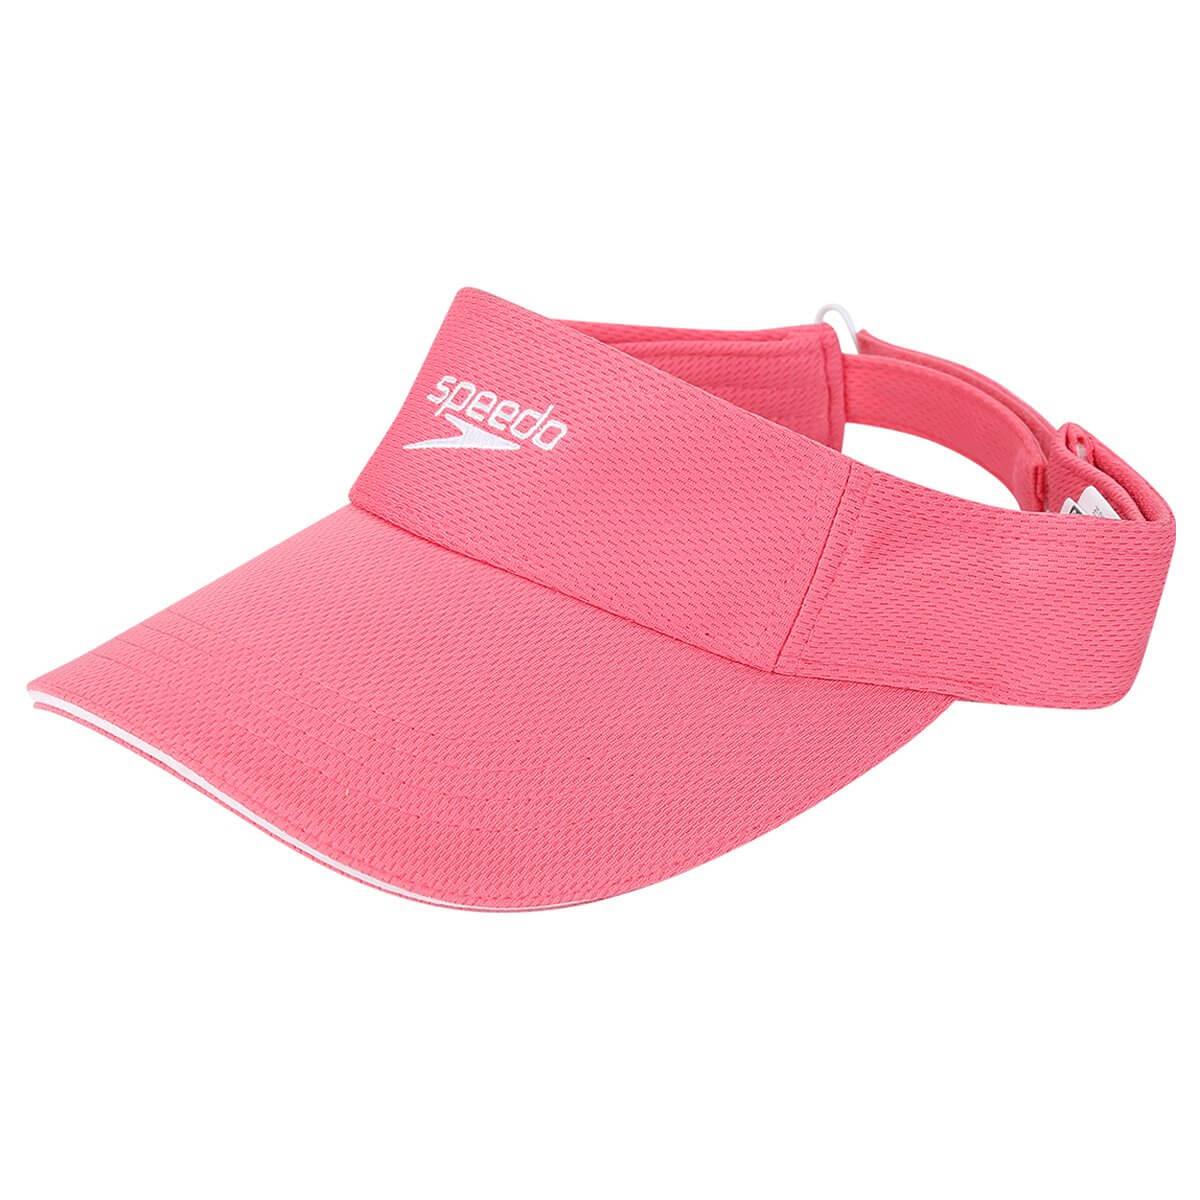 Viseira Boné Speedo Wave Para Esporte Corrida Rosa